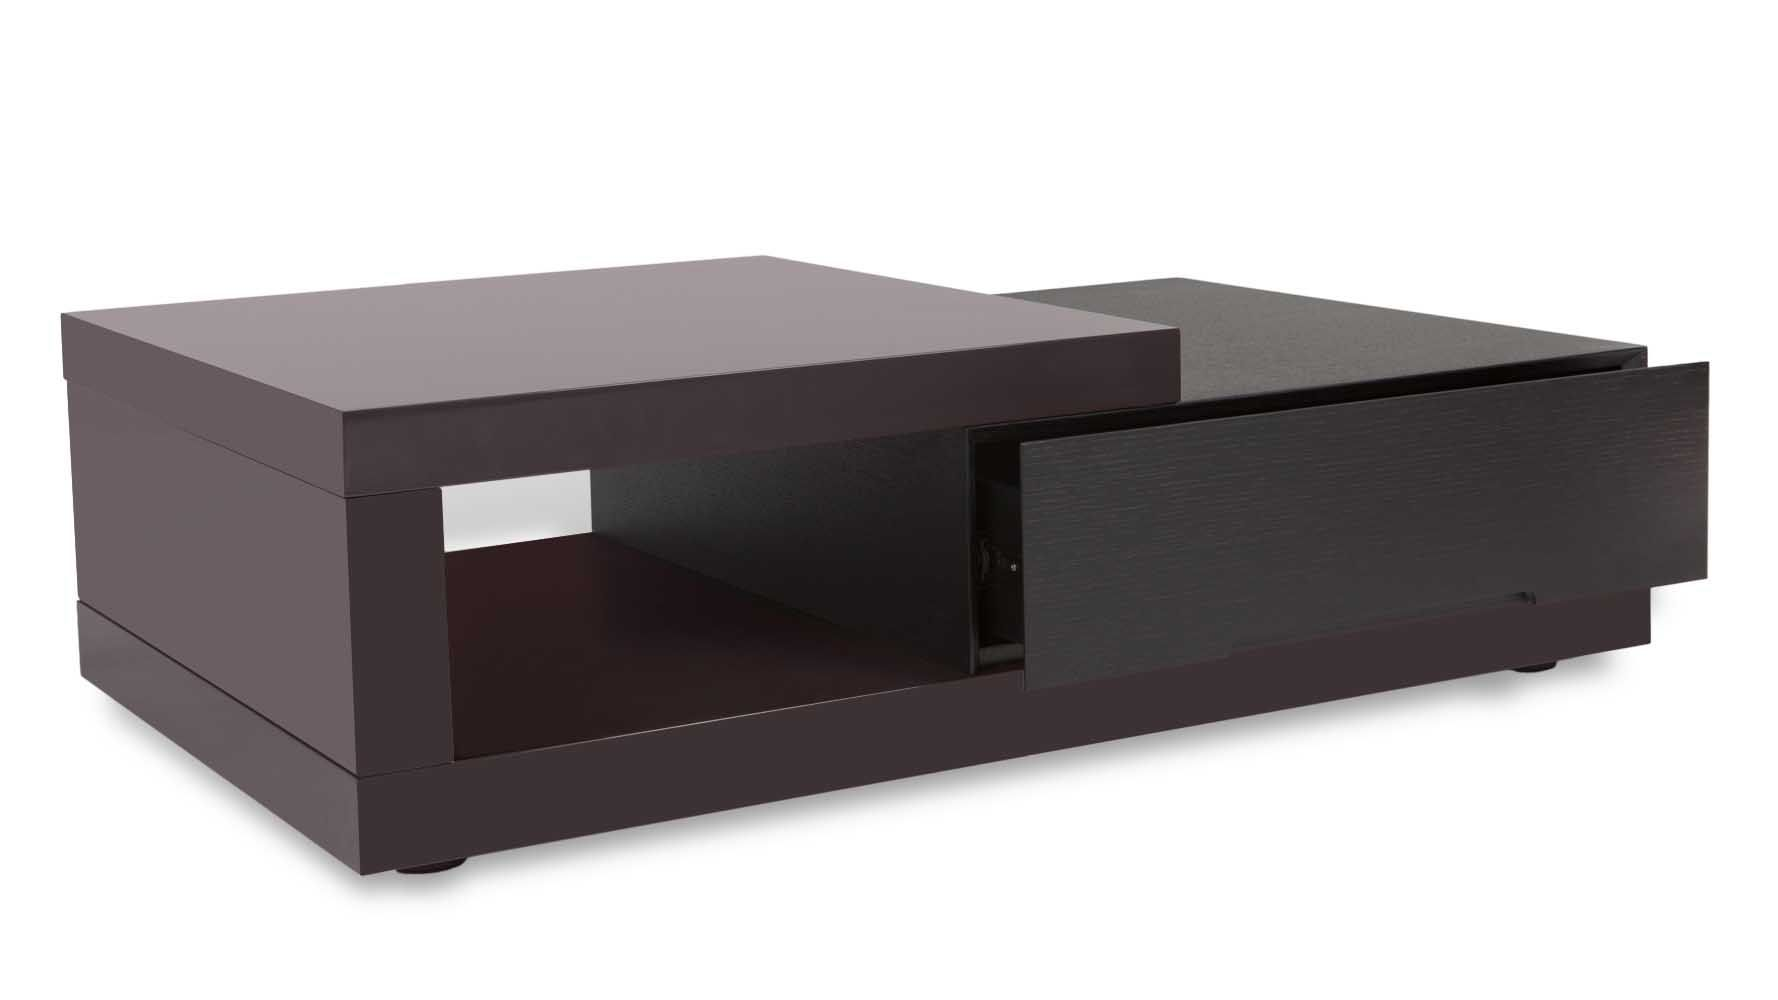 Nova Coffee Table Living Room Styles Coffee Table Brown Coffee Table Black and brown coffee table